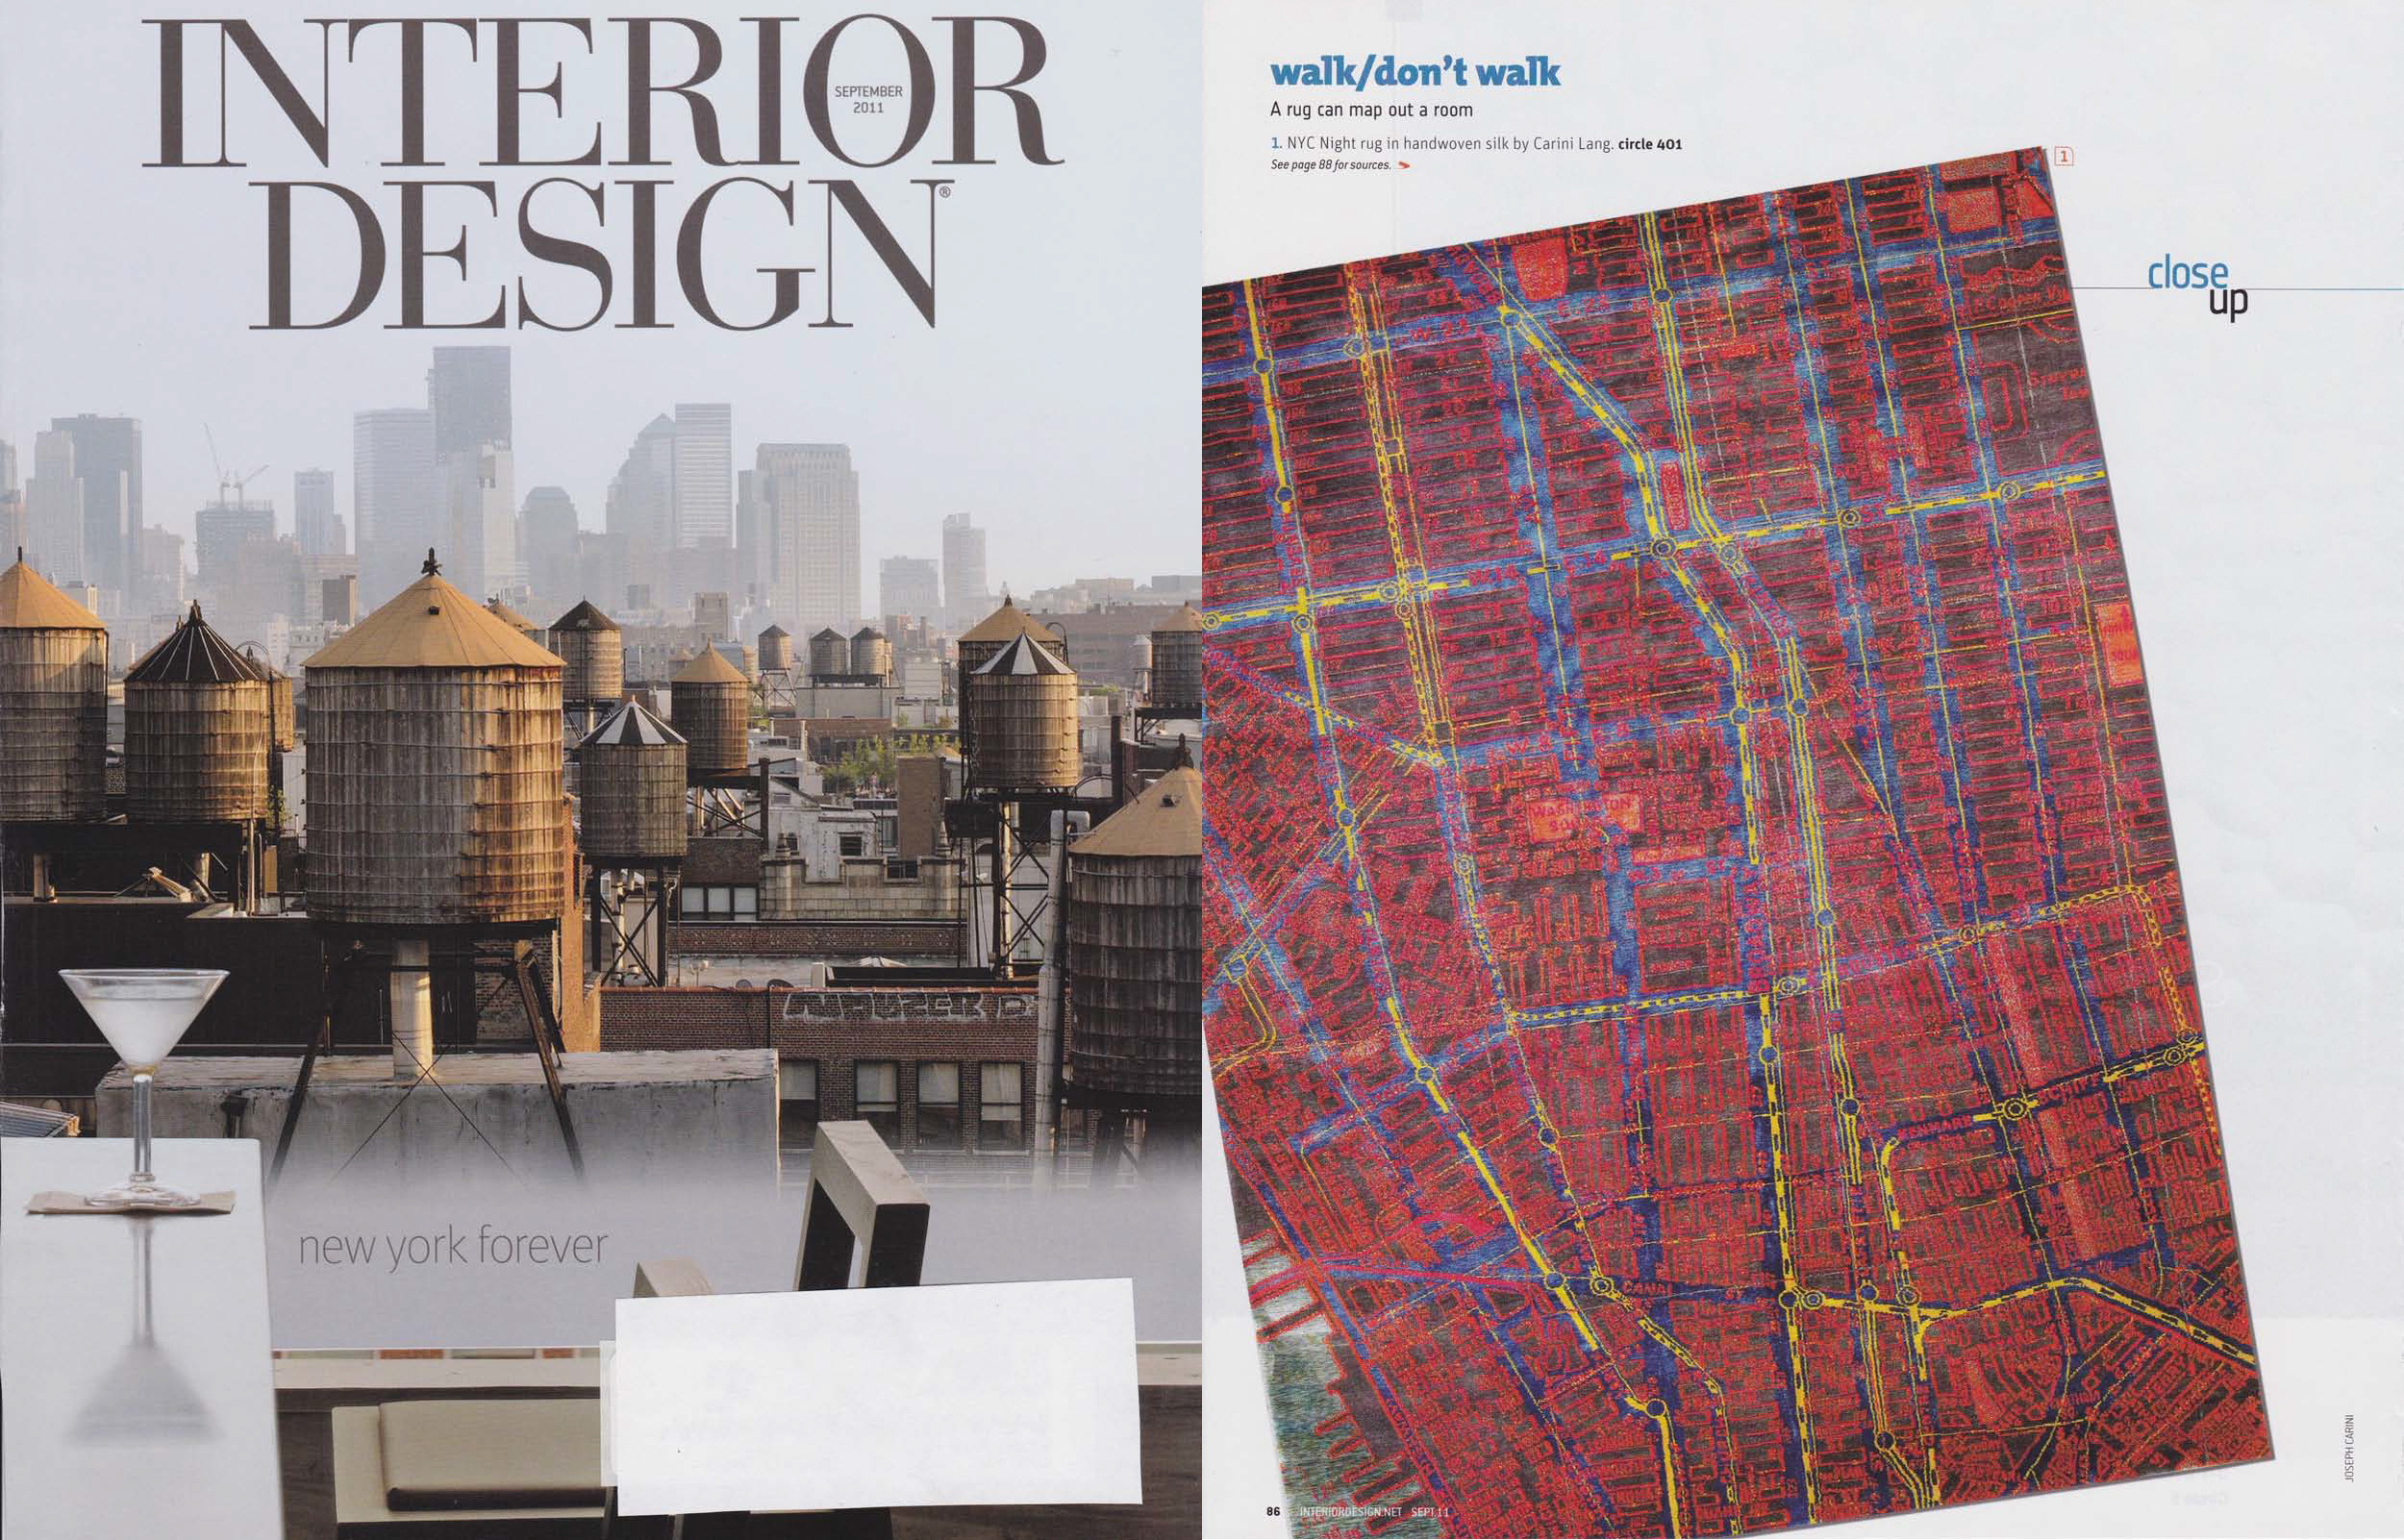 Interior Design - September 2011 - PDF 2-1.jpg